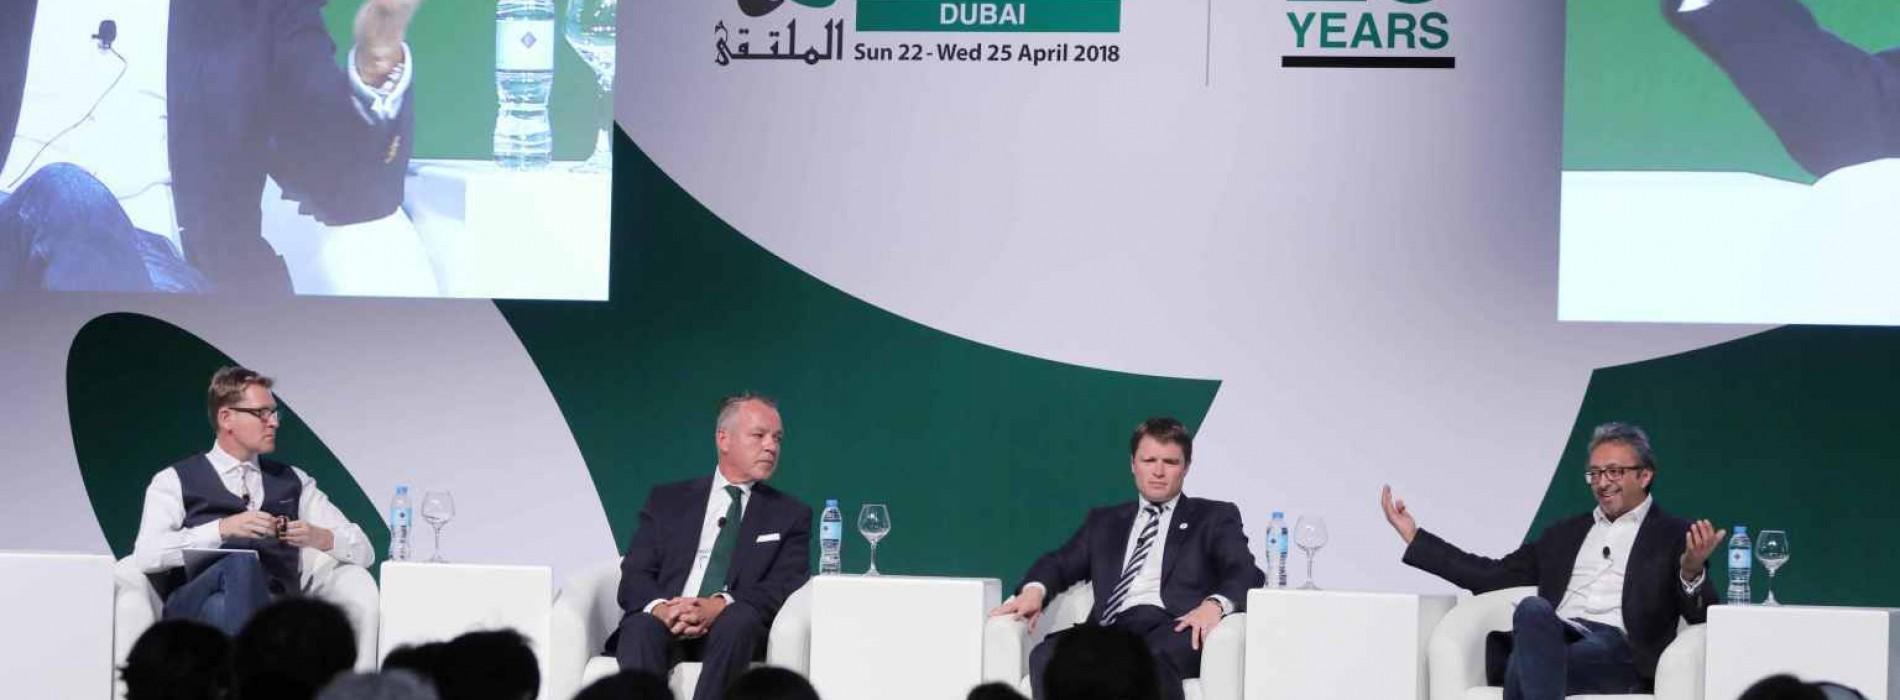 Hyperloop could transit passengers between Al Maktoum International and Dubai International